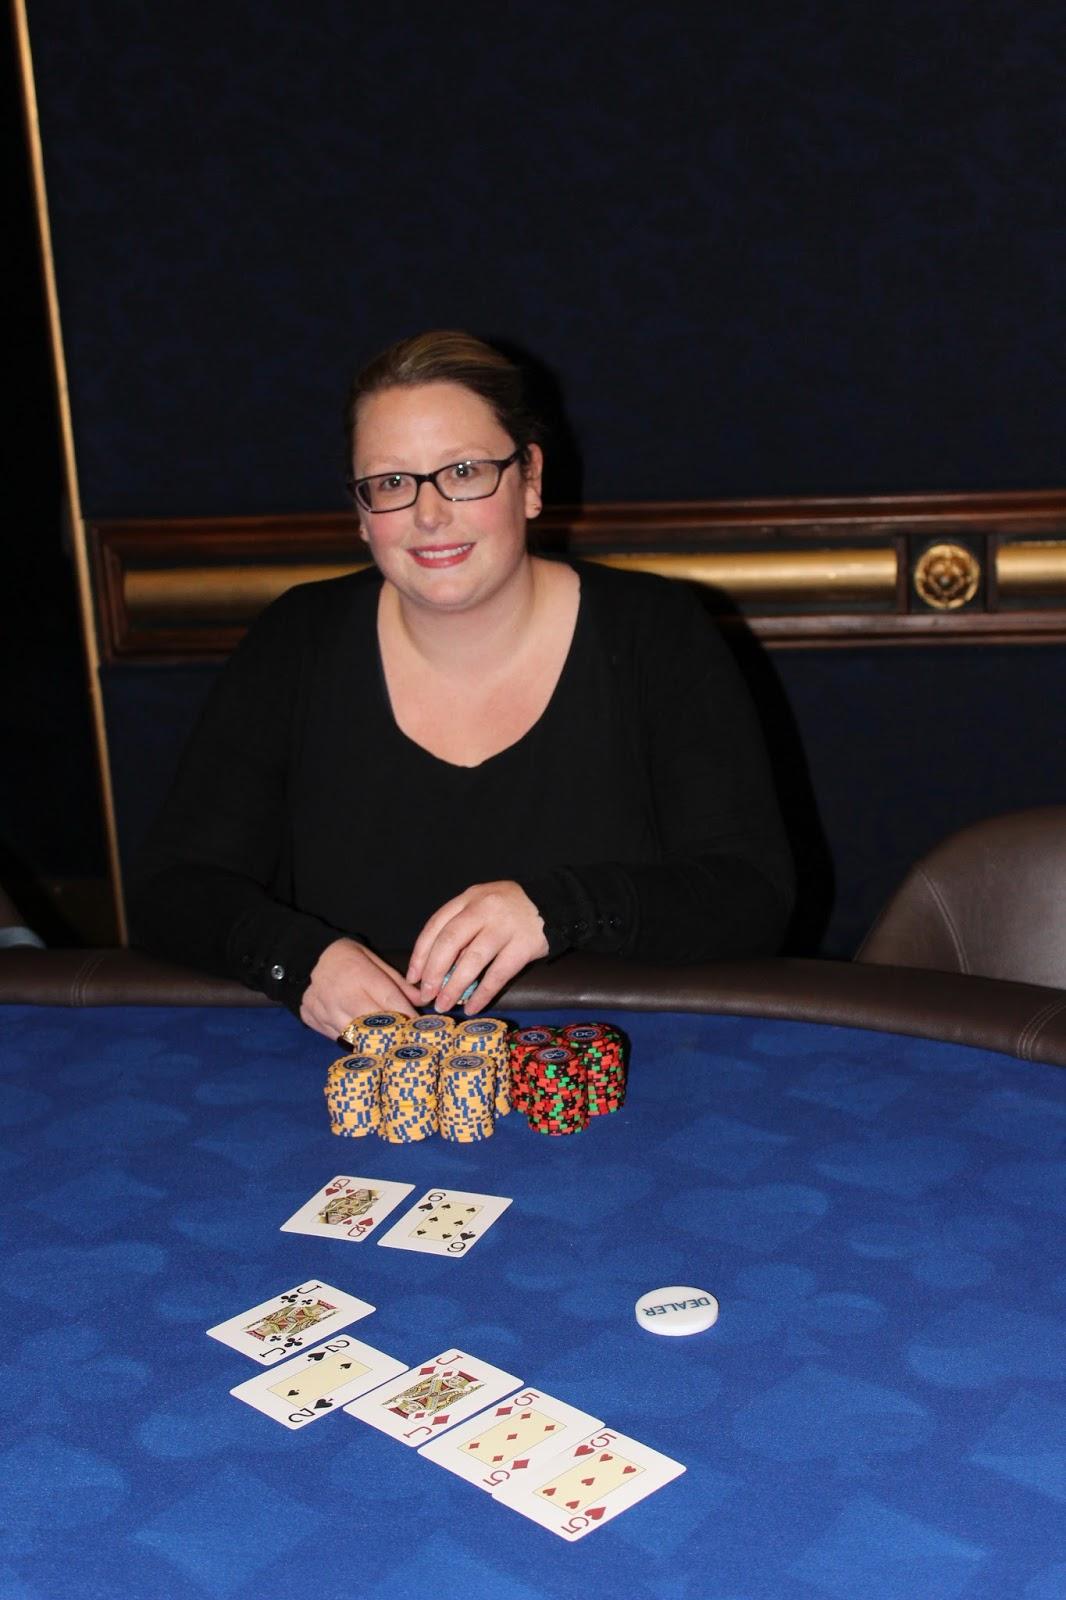 Charlotte Poker Dunedin Casino poker deepstack